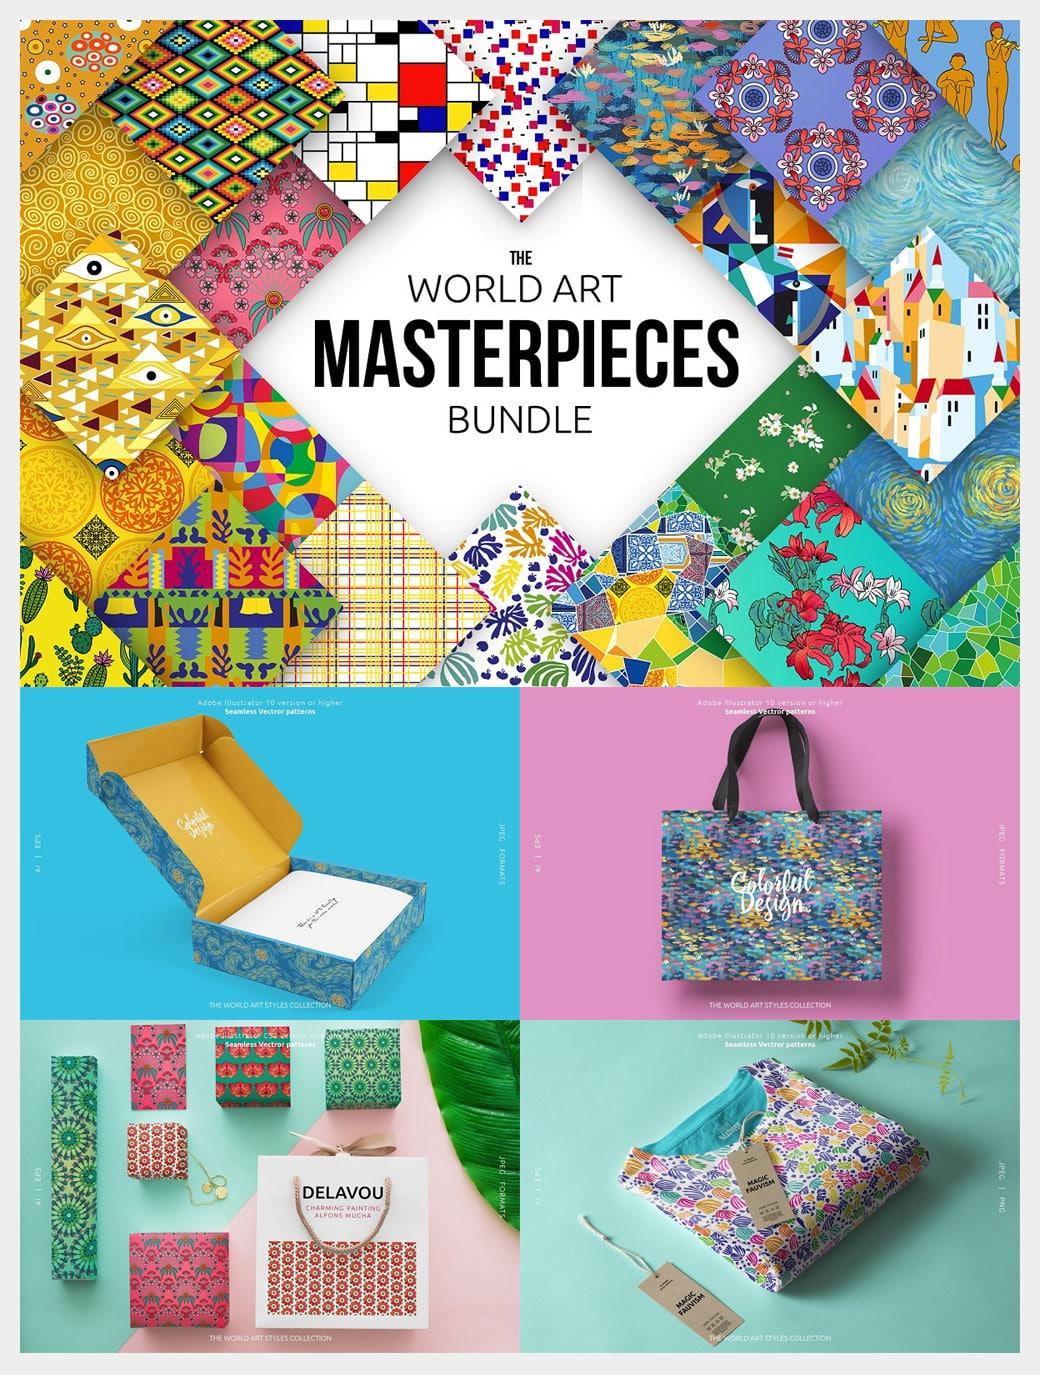 The World Art Masterpieces Patterns Bundle